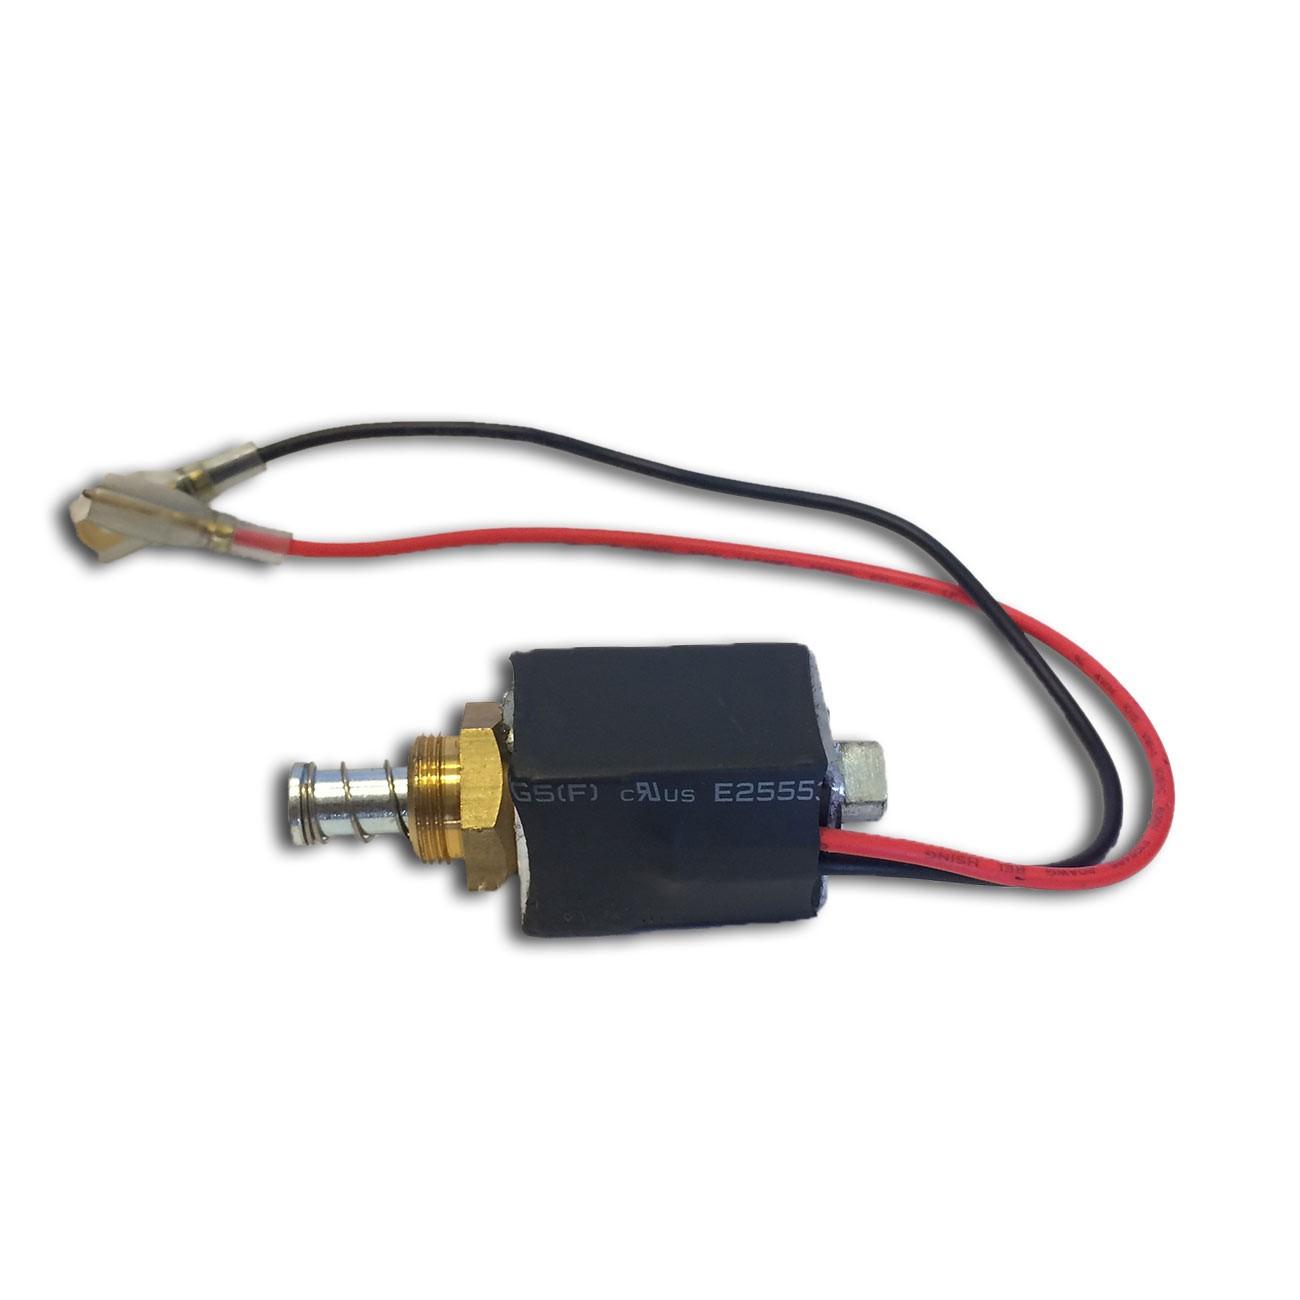 Solenoid part AF 1000S 1 Pro Heatinga 1300 1